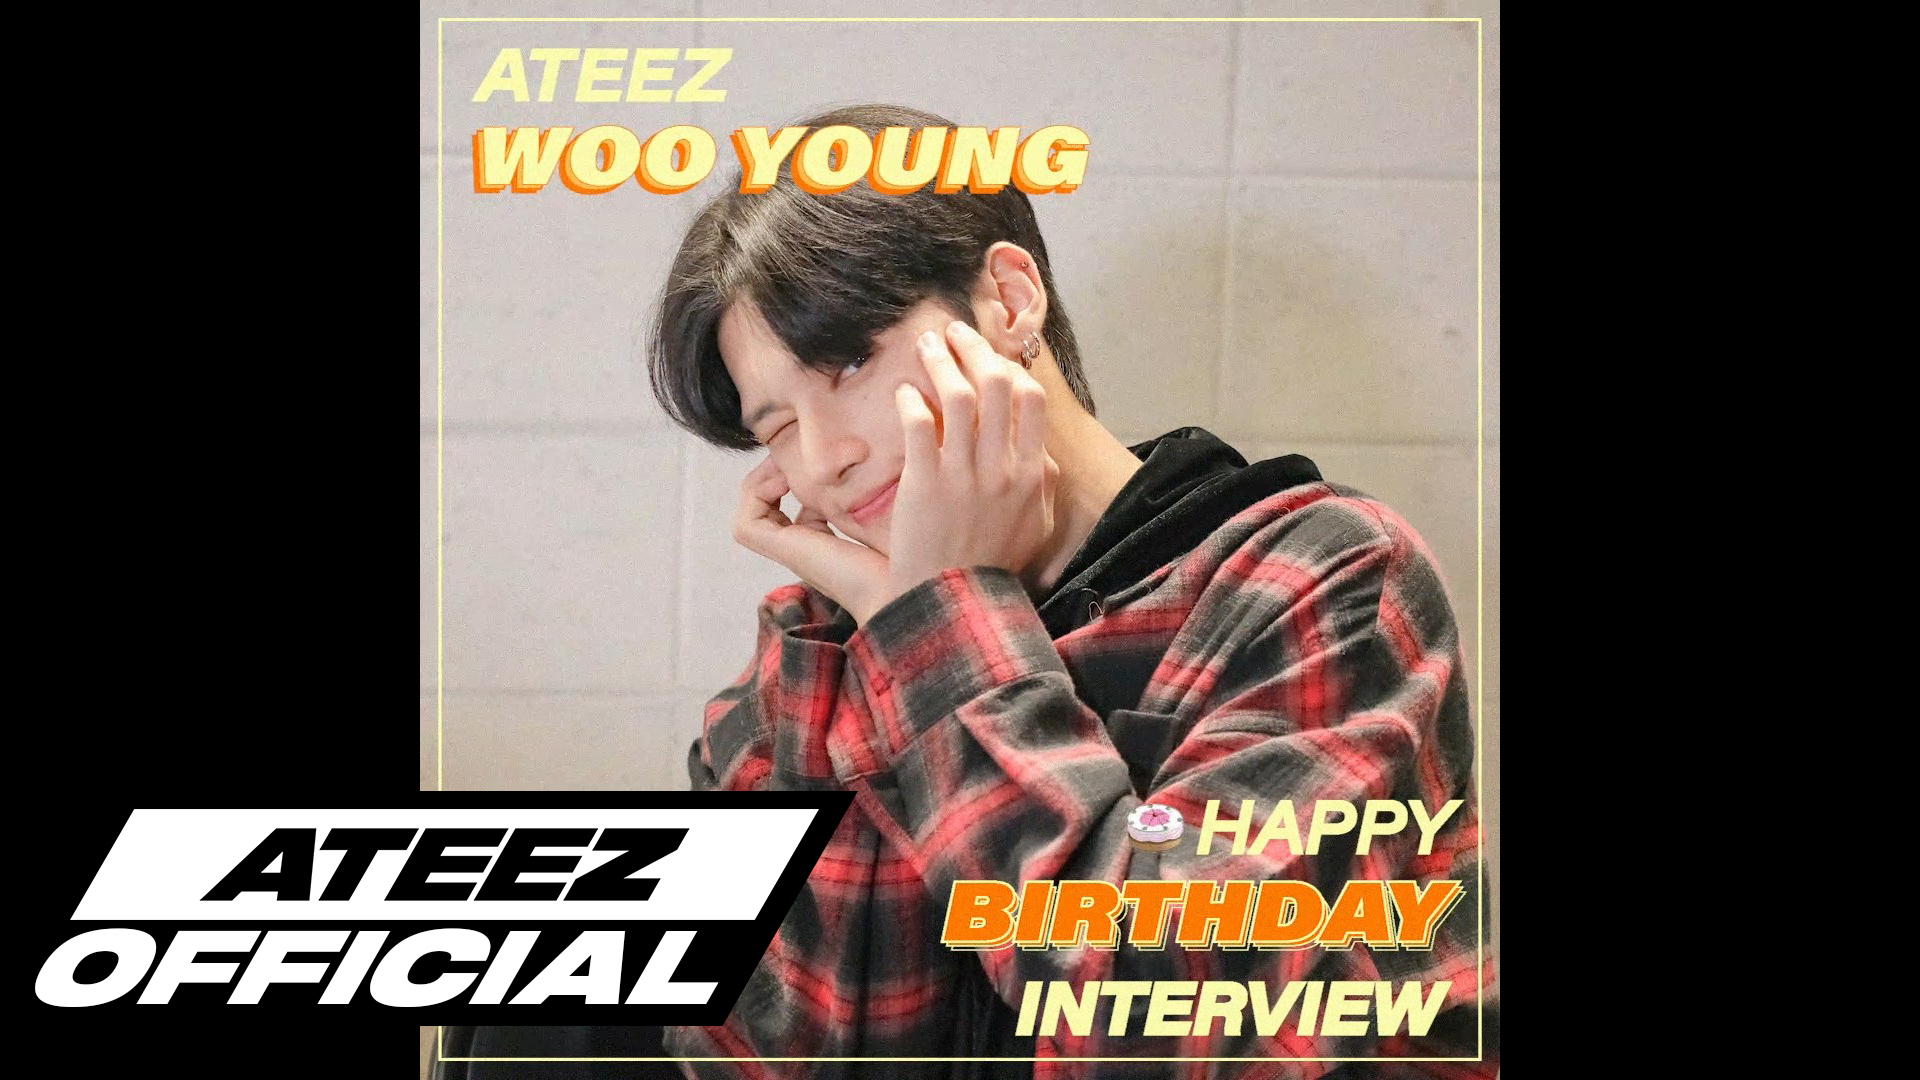 ATEEZ(에이티즈) 우영 생일 8문 8답 INTERVIEW